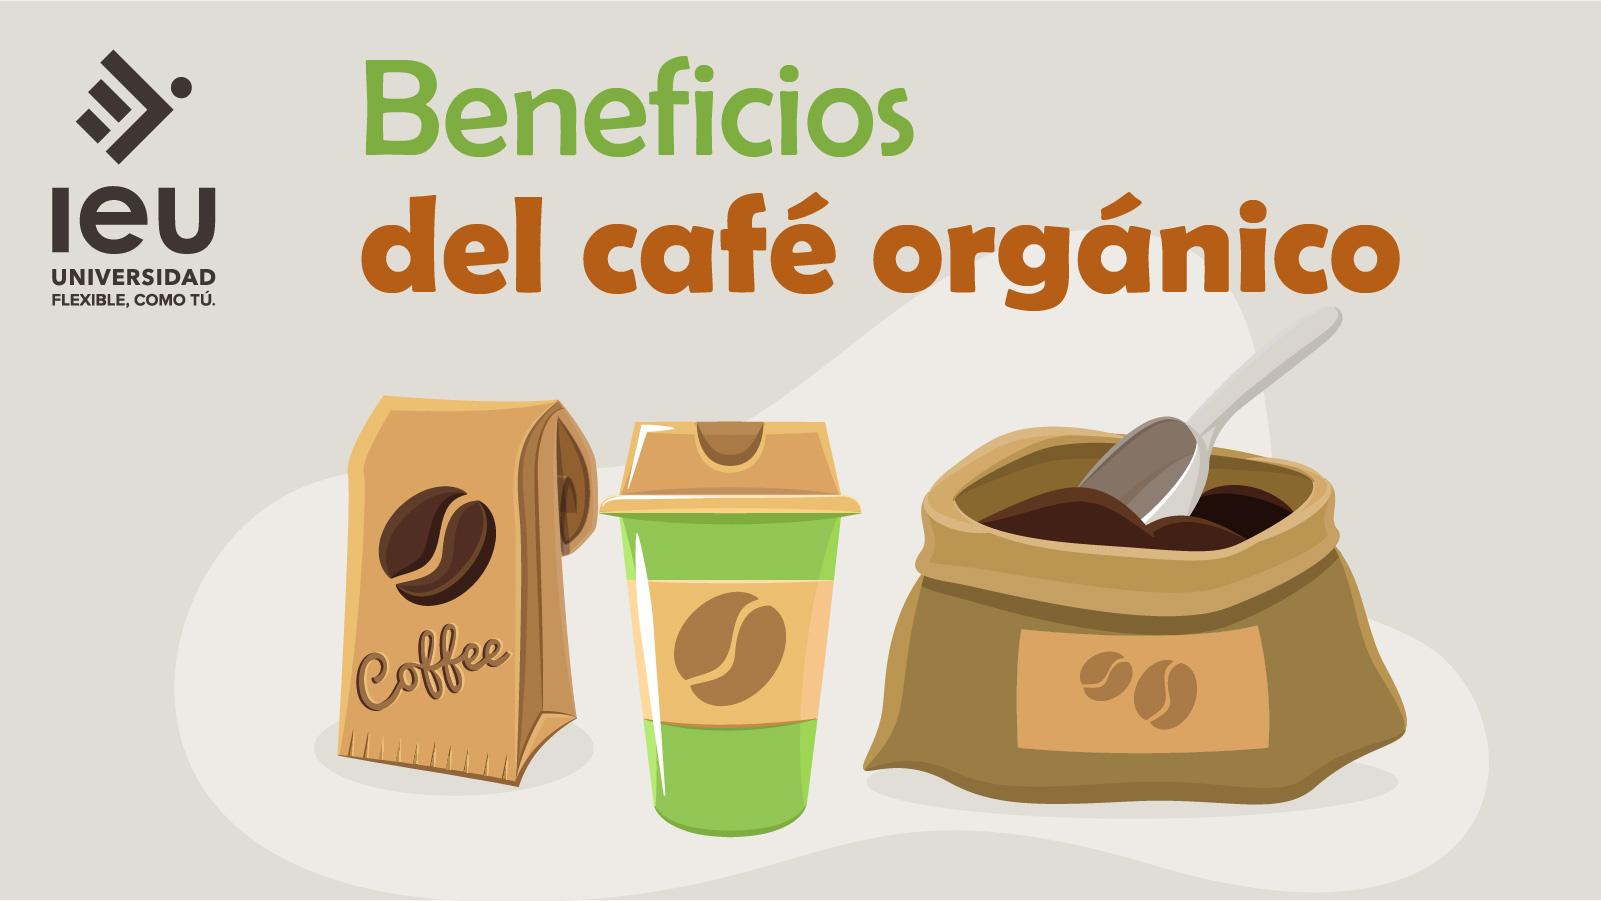 Beneficios Del Café Orgánico 02